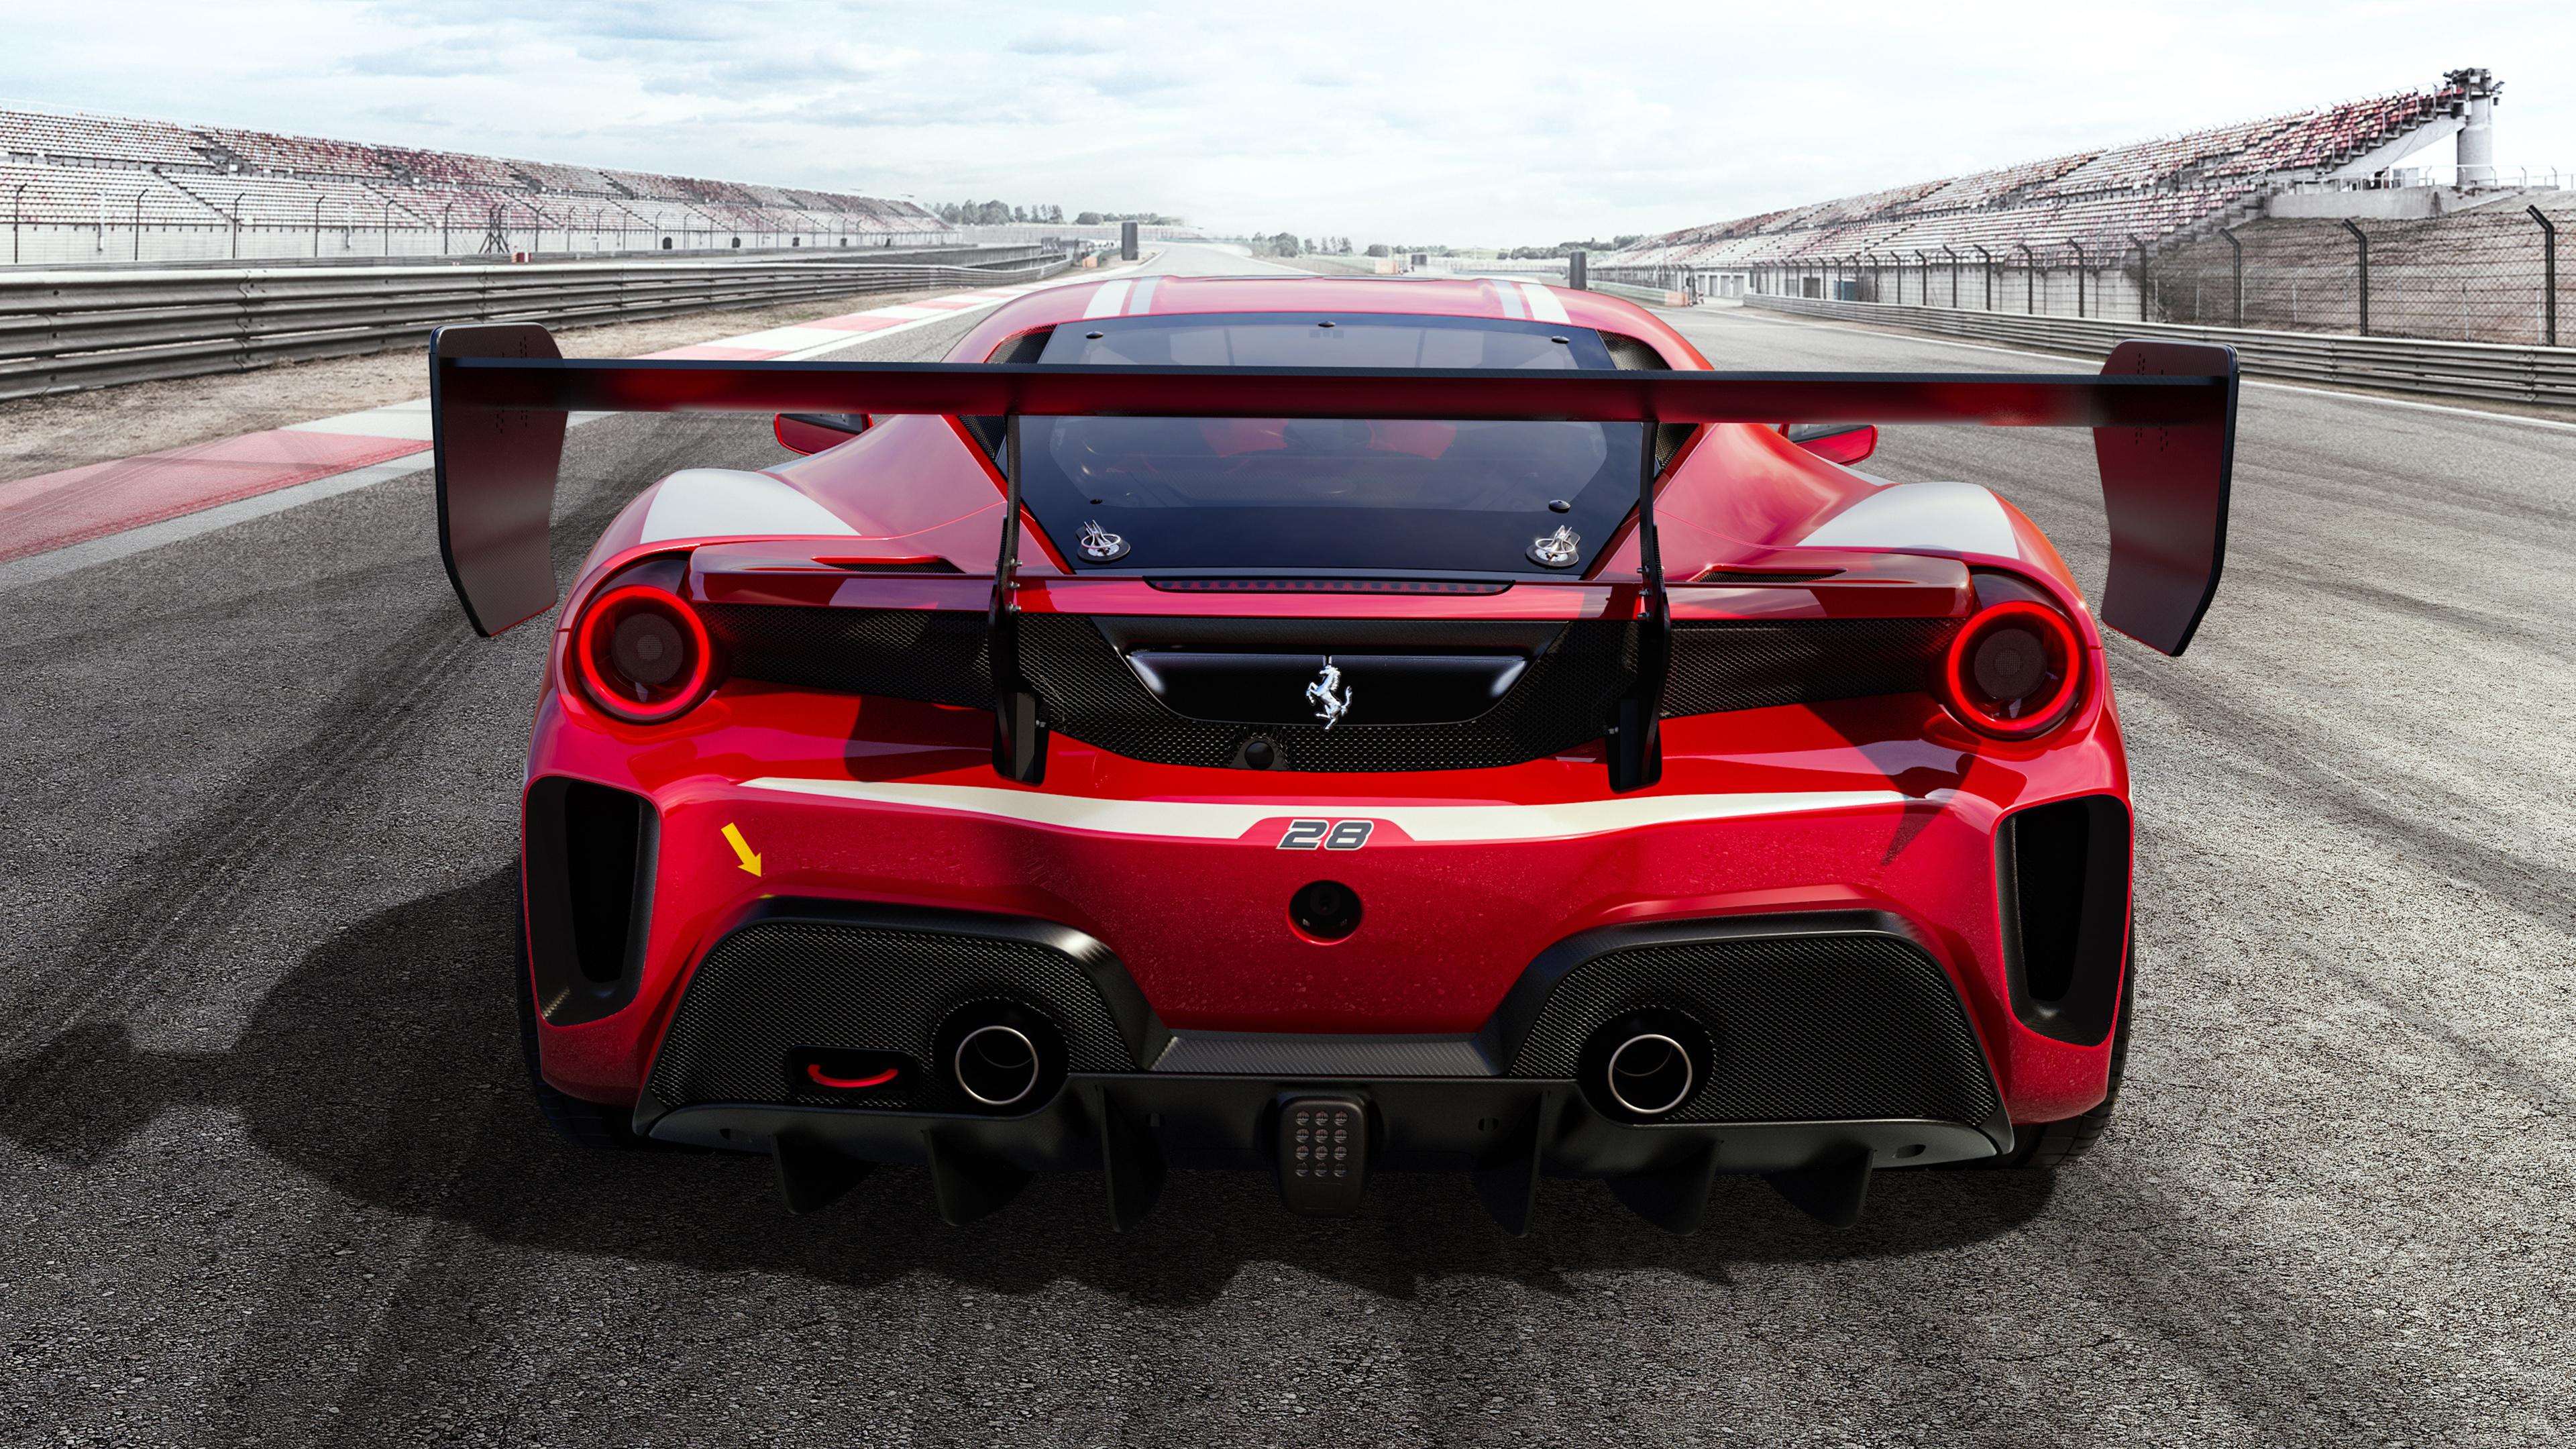 Ferrari 488 Challenge Evo 2020 4K 2 Wallpaper HD Car Wallpapers 3840x2160